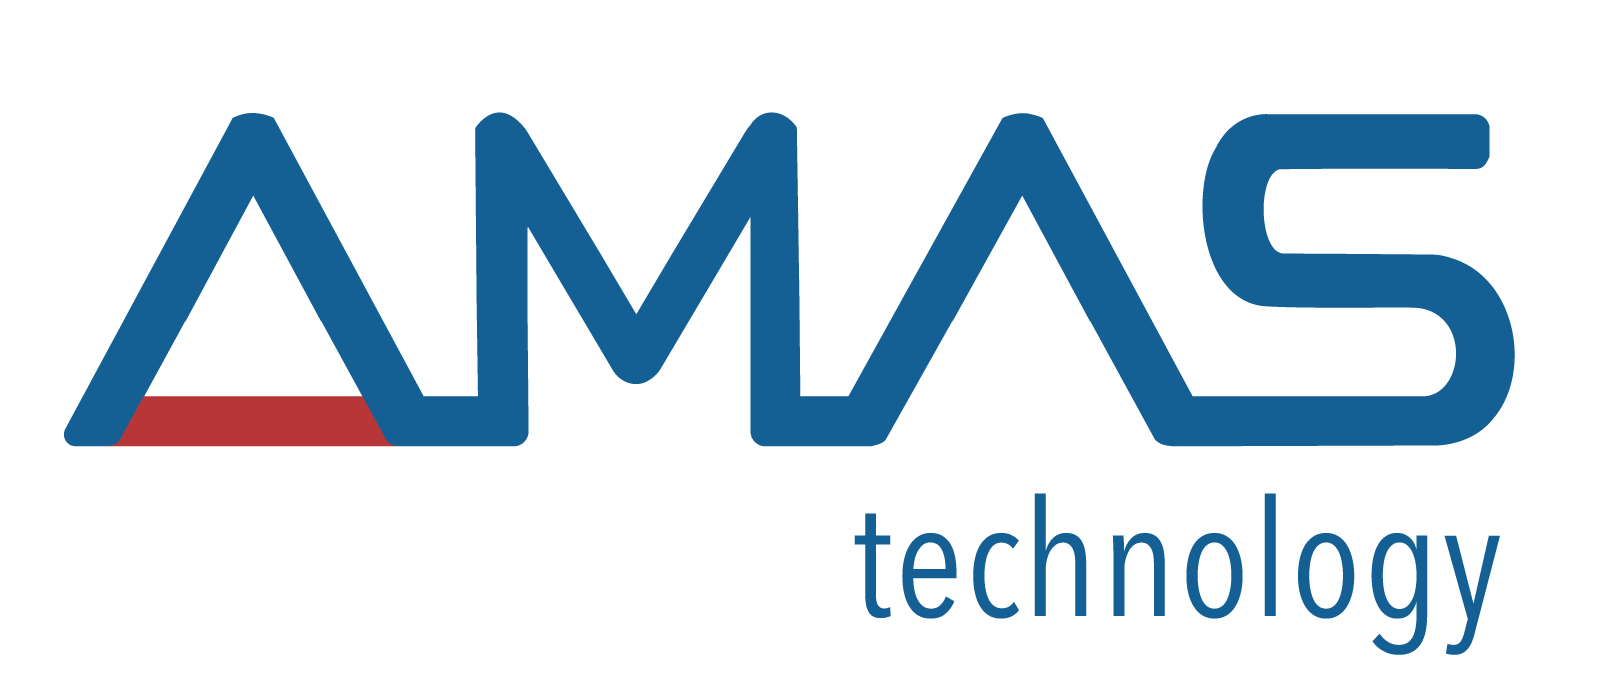 AMAS Technology